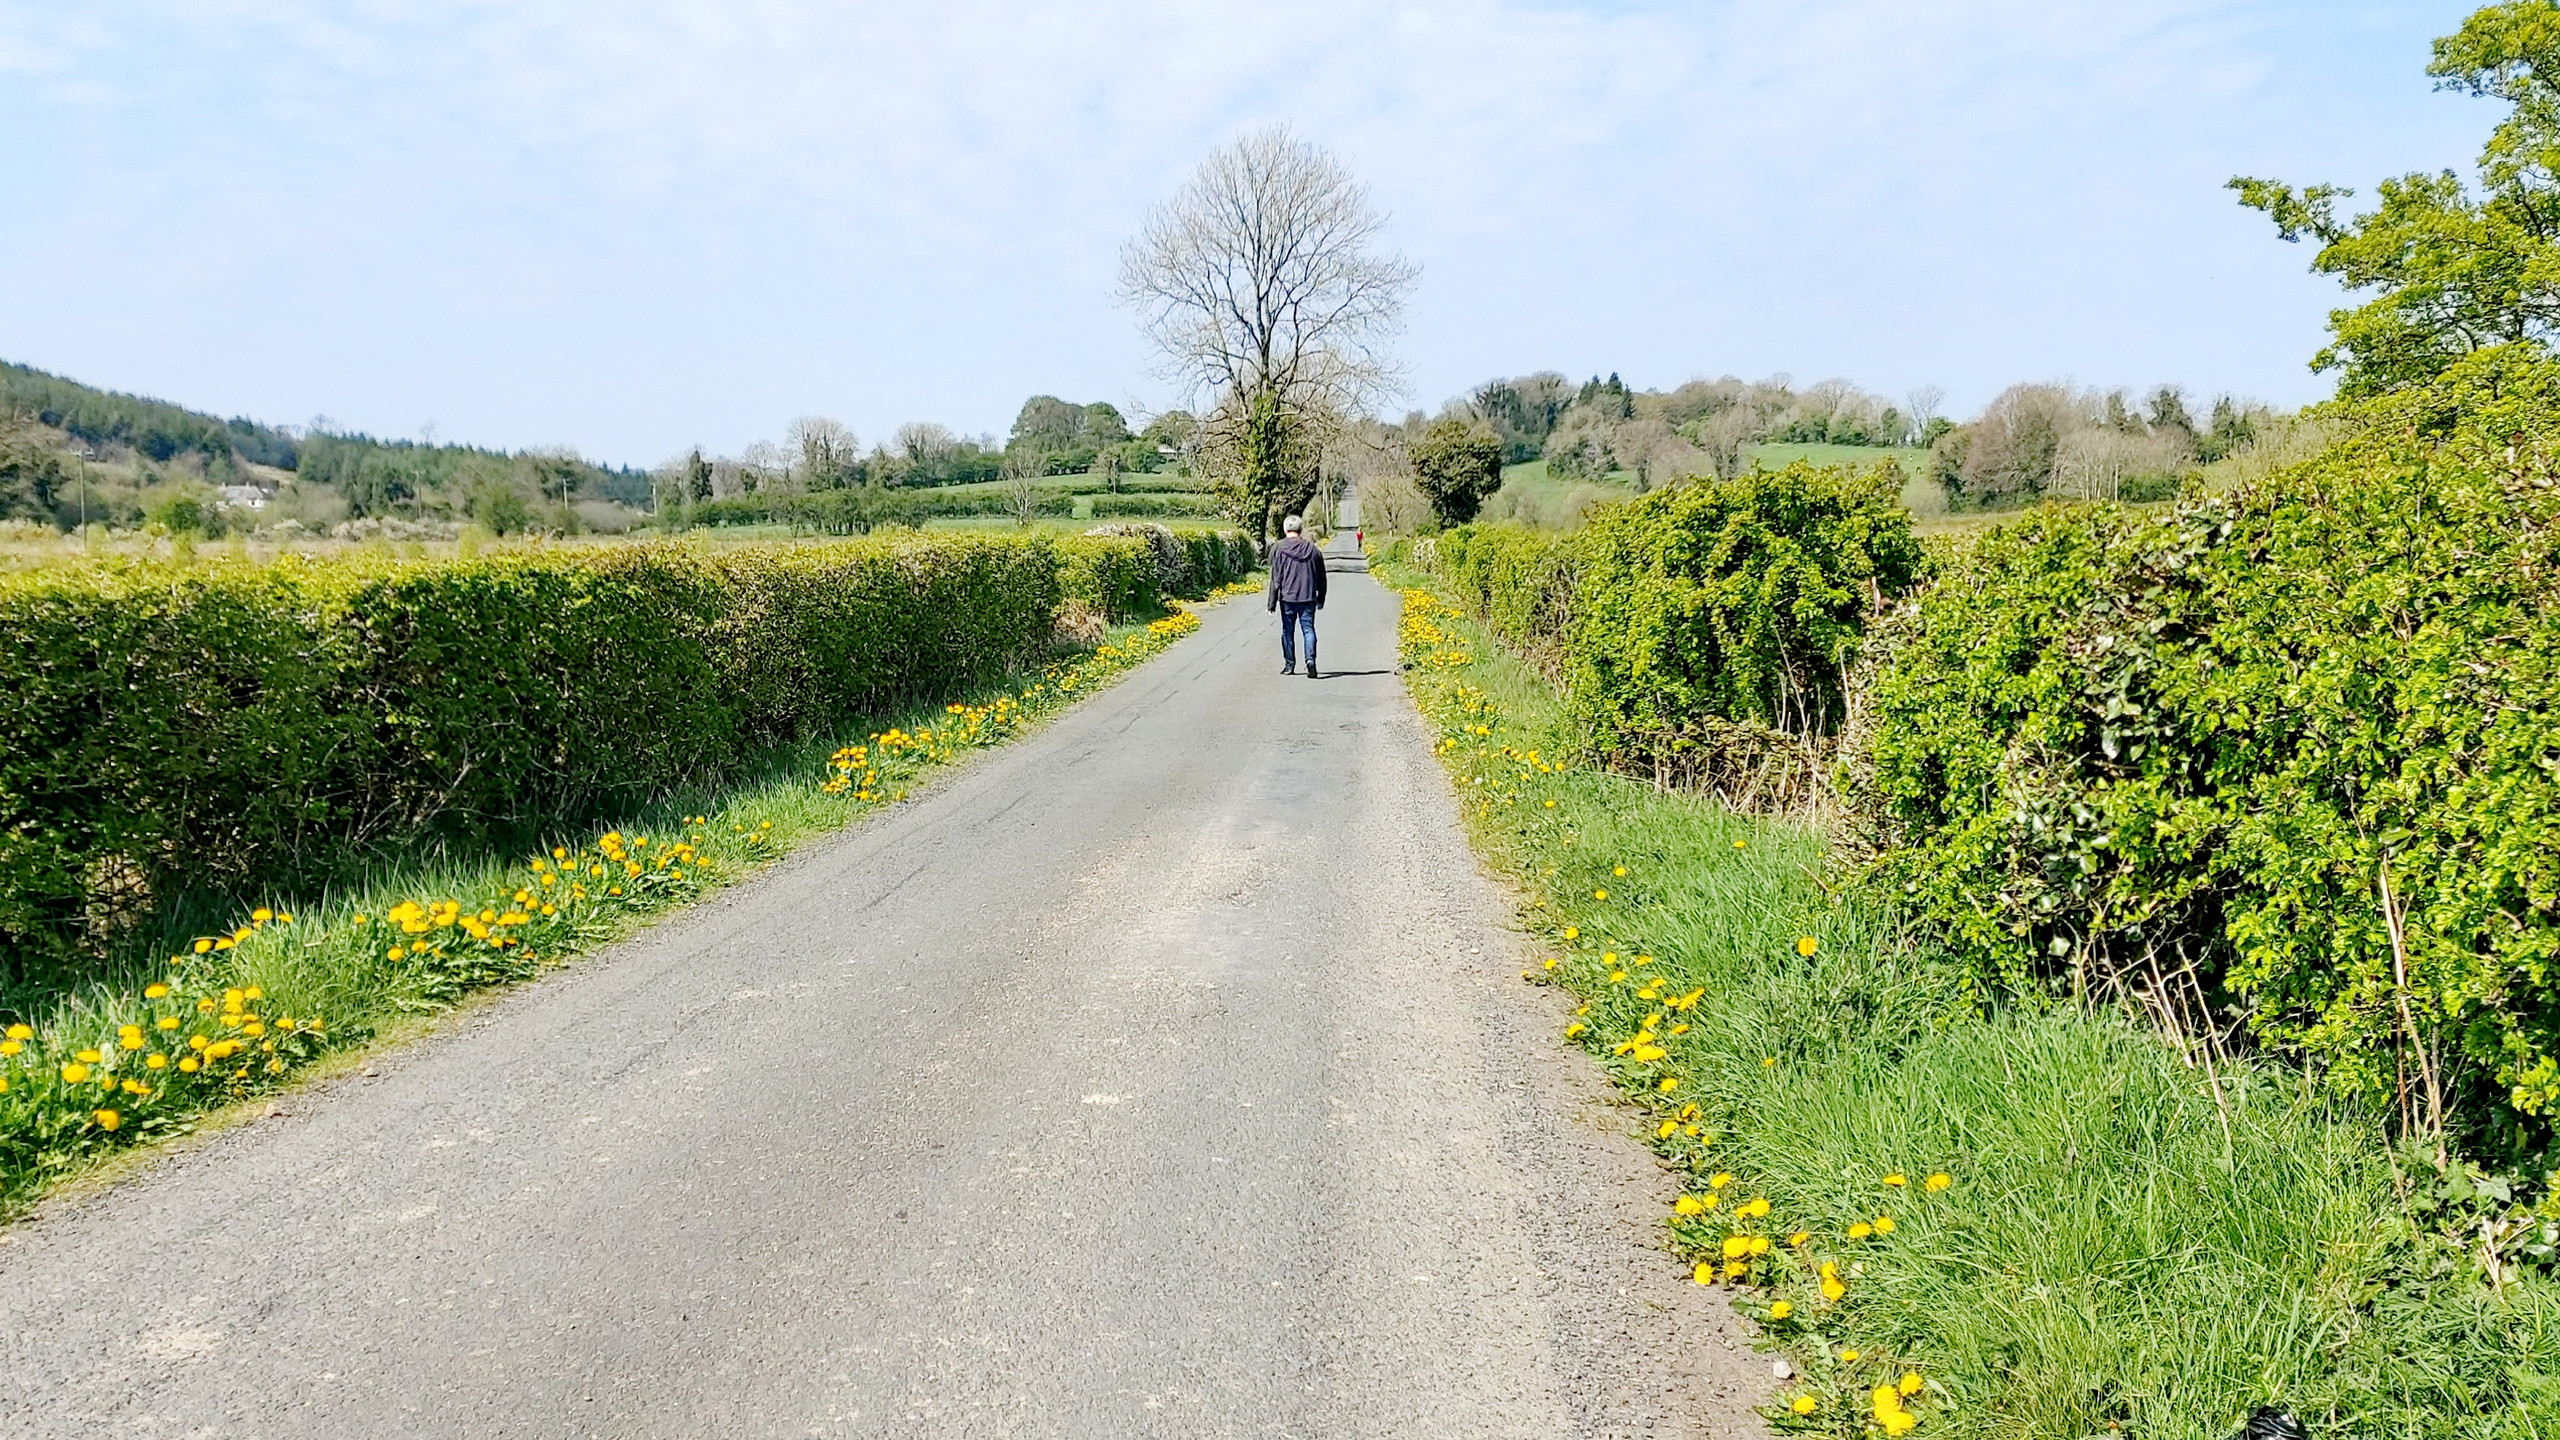 Dandelion drive-way